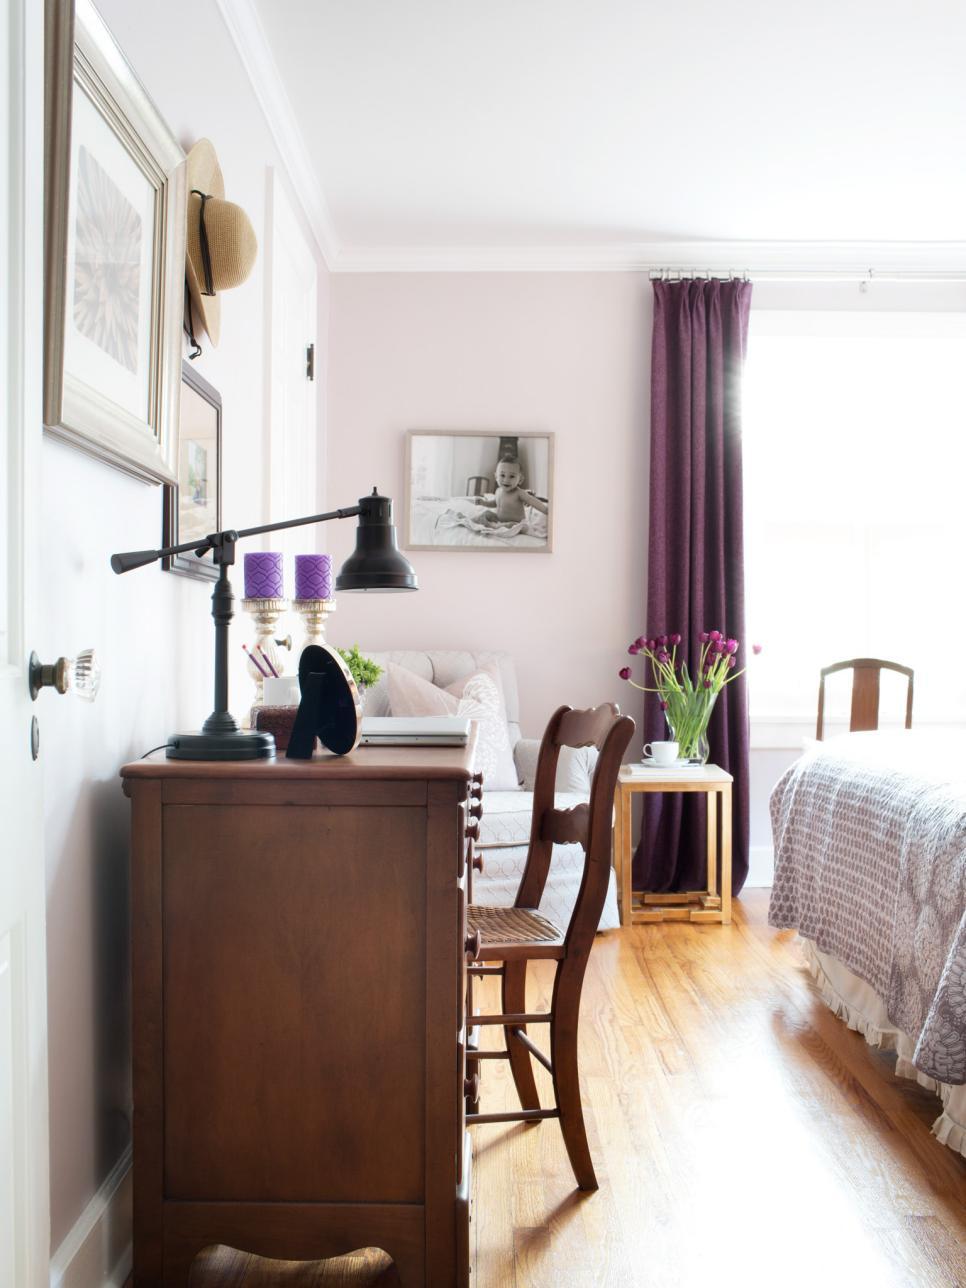 traditional bedroom ideas, furniture & decor | hgtv